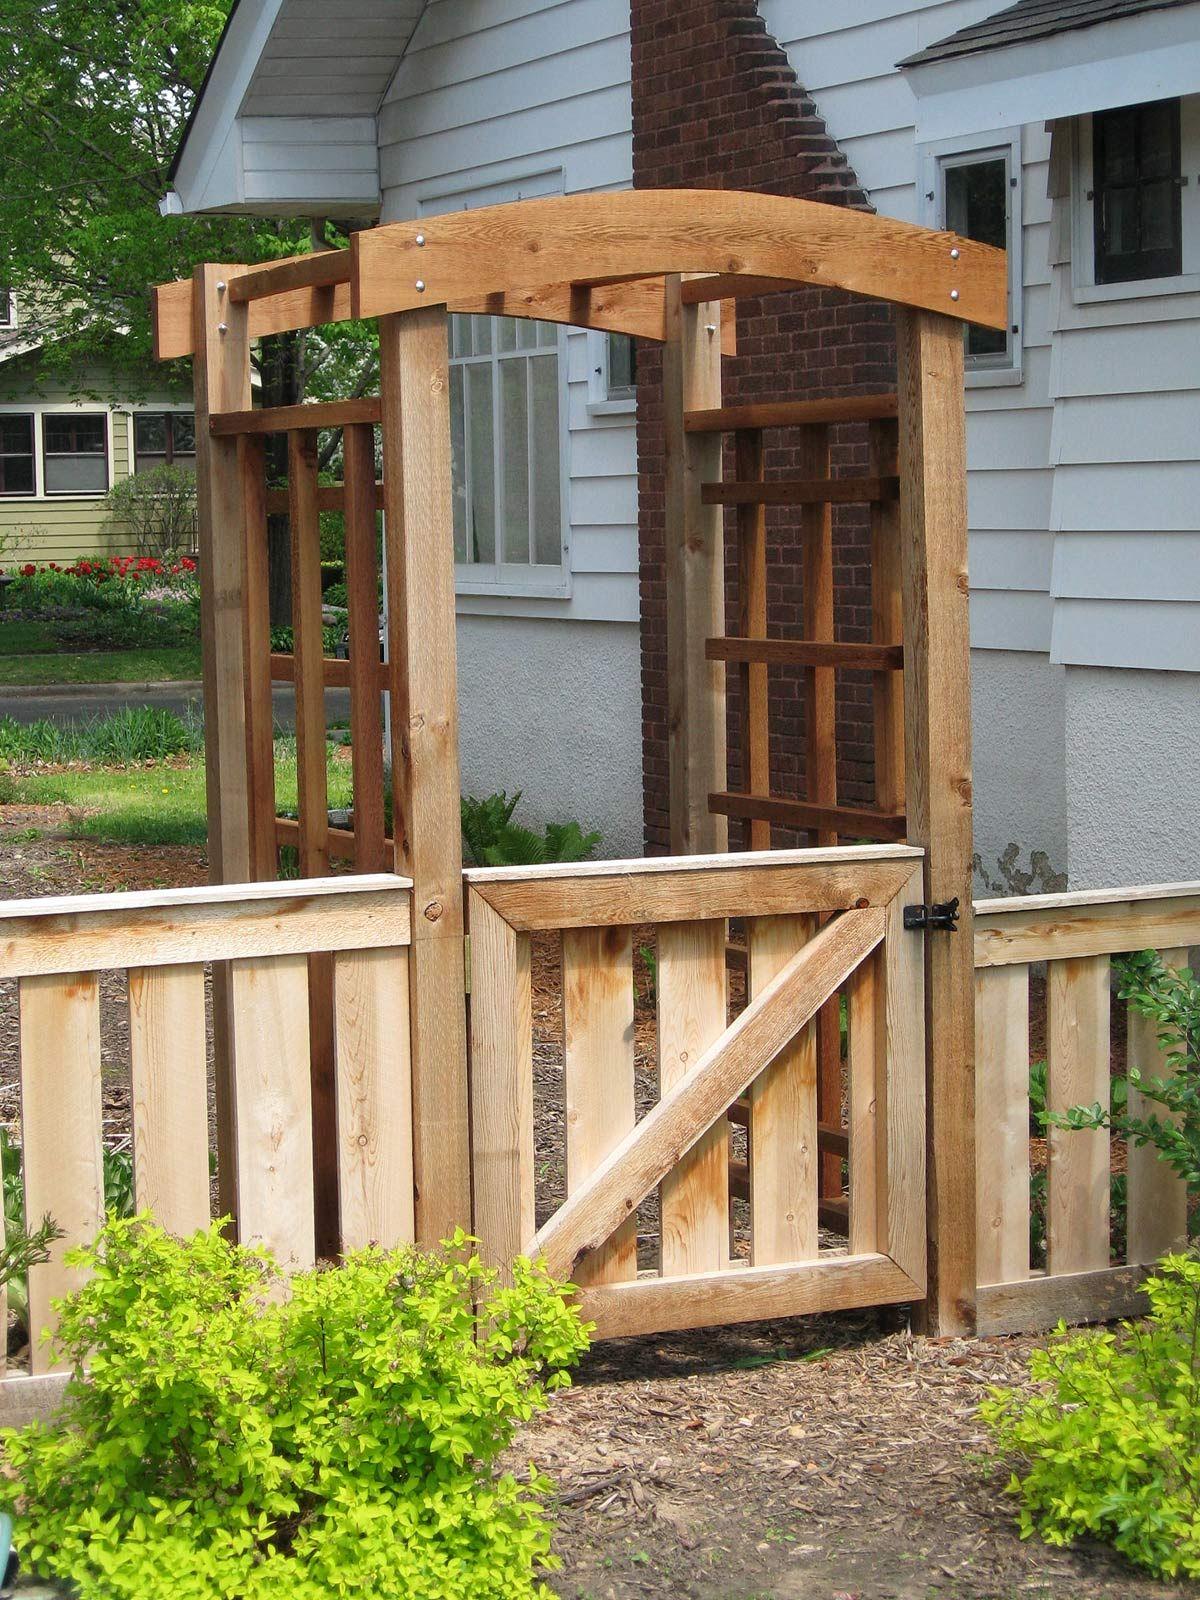 Making Bentwood Trellises Arbors Gates Fences Garden